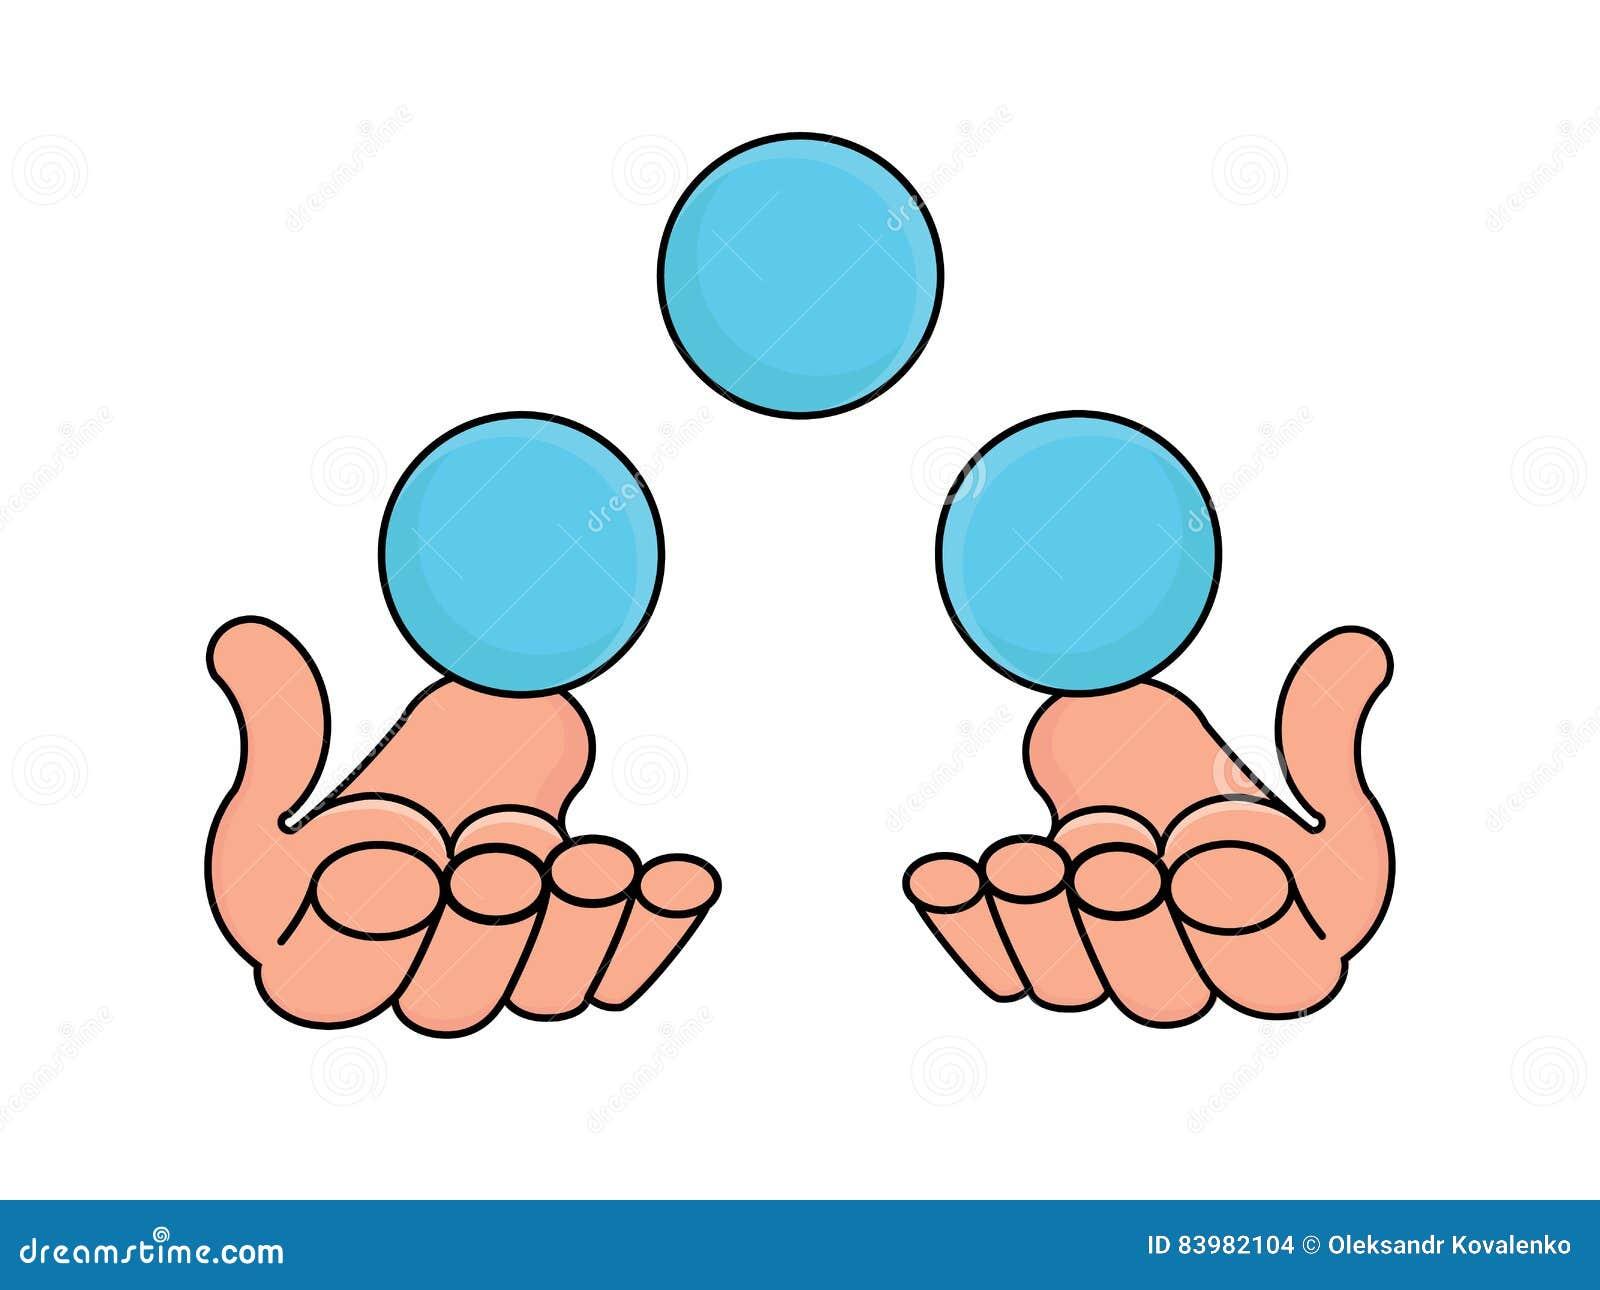 how to make blue balls